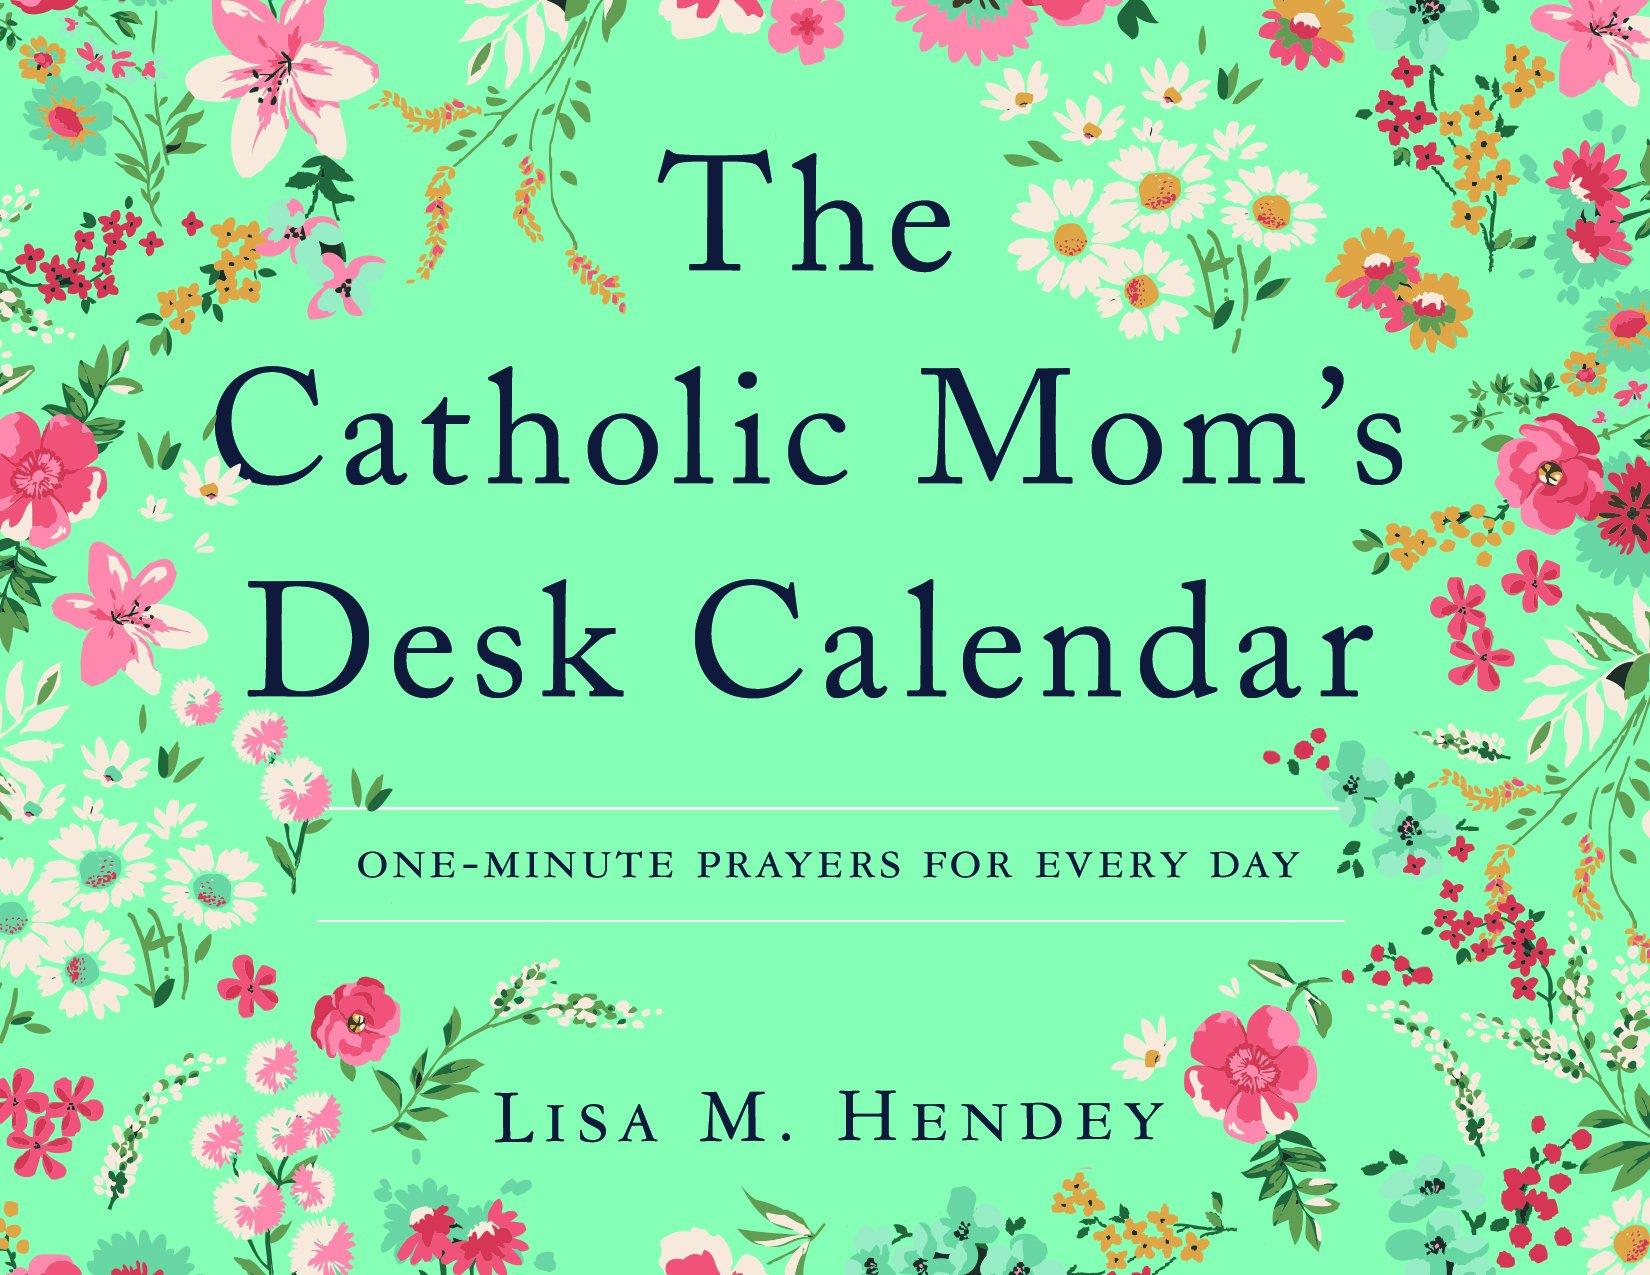 The Catholic Mom's Desk Calendar: One-Minute Prayers for Every Day: Lisa M.  Hendey: 9781593253202: Amazon.com: Books